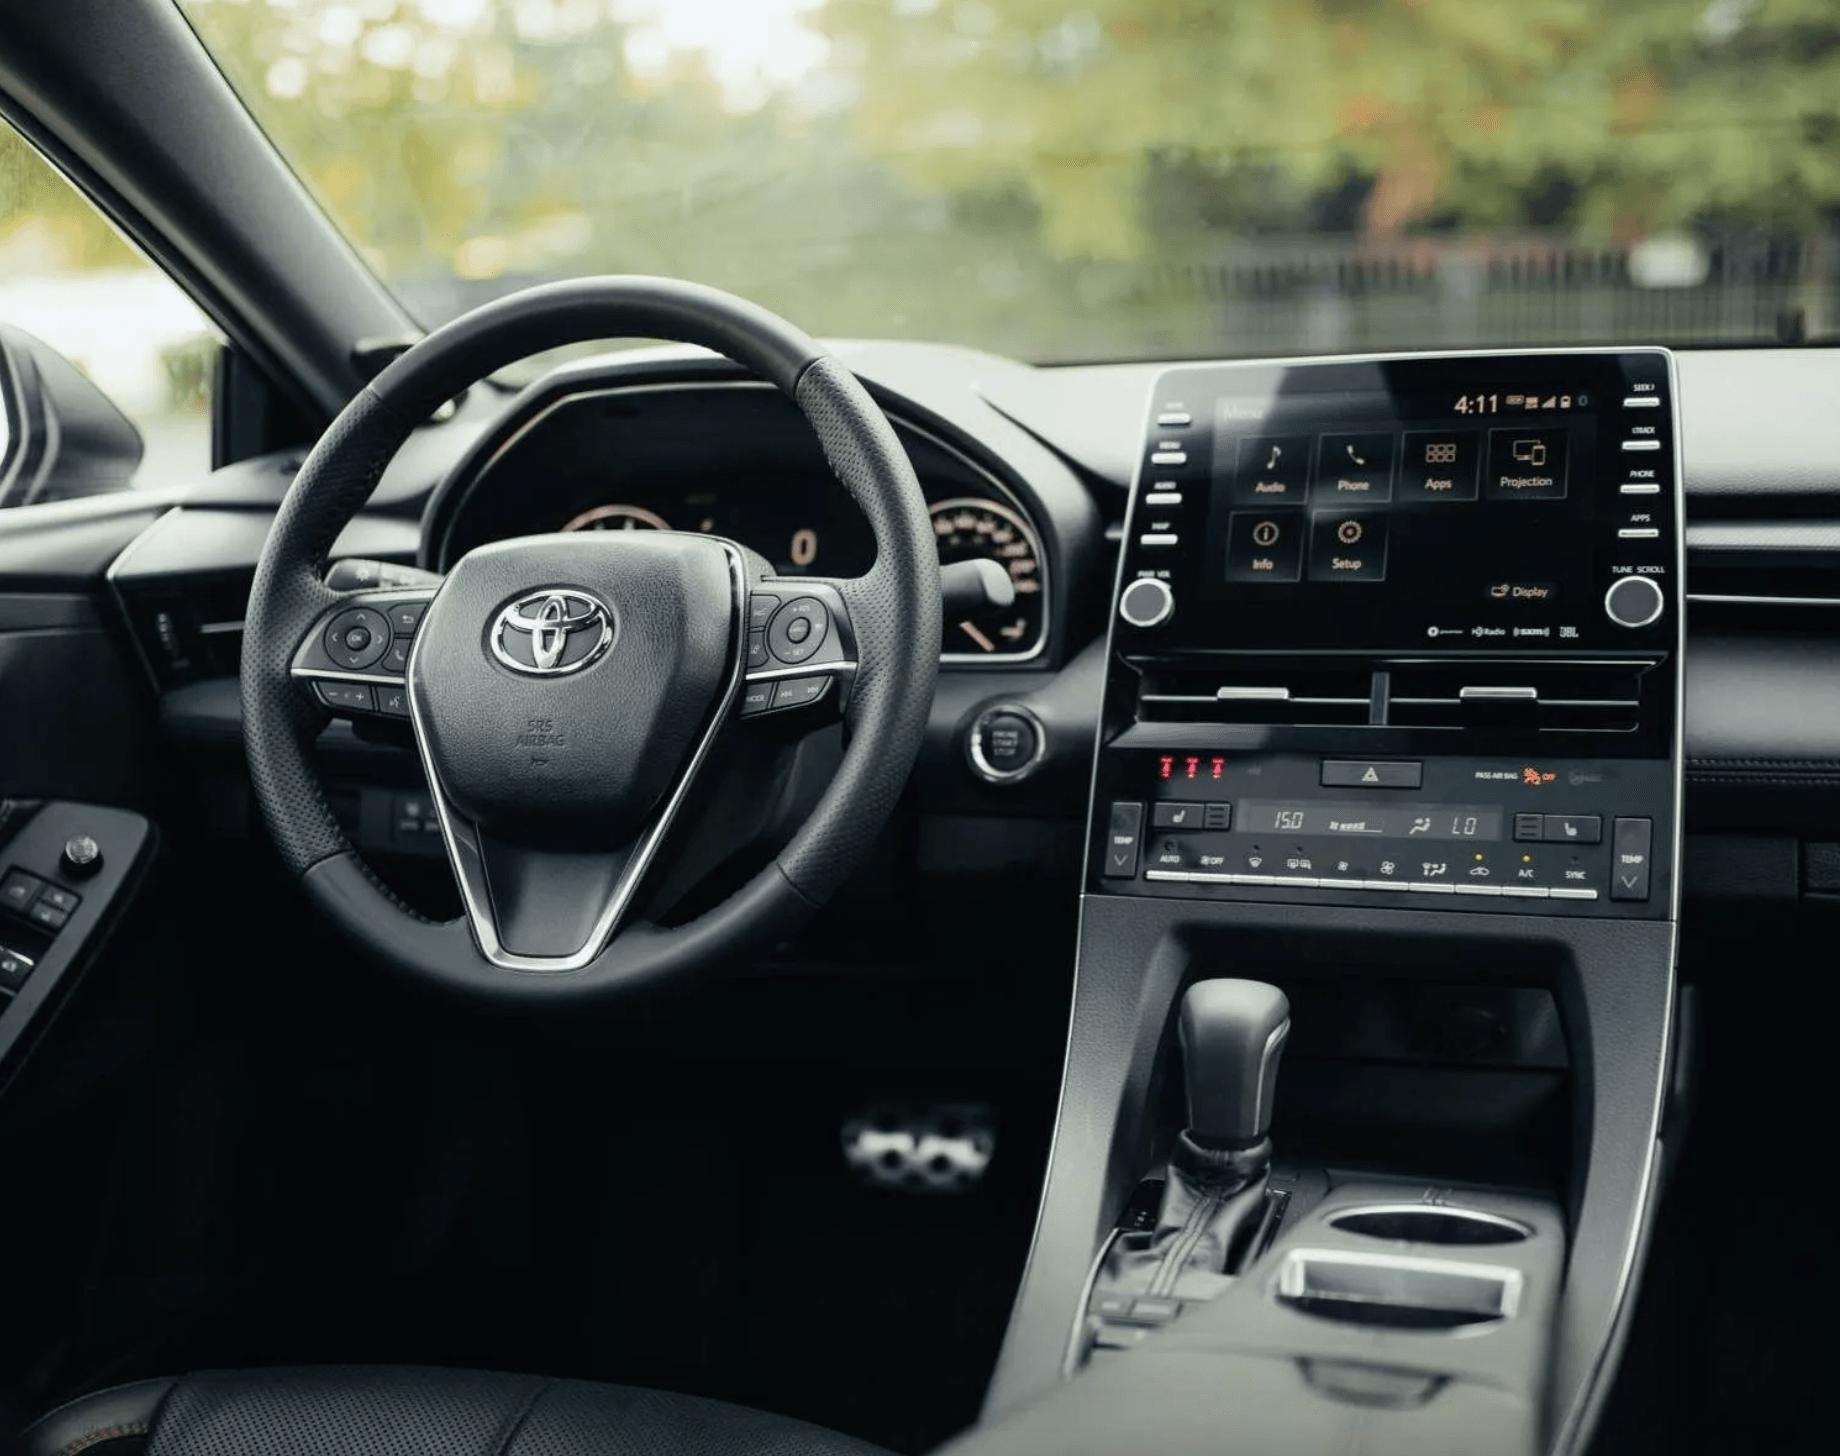 2020 Toyota Avalon Controls@ Ken Shaw Toyota in Toronto